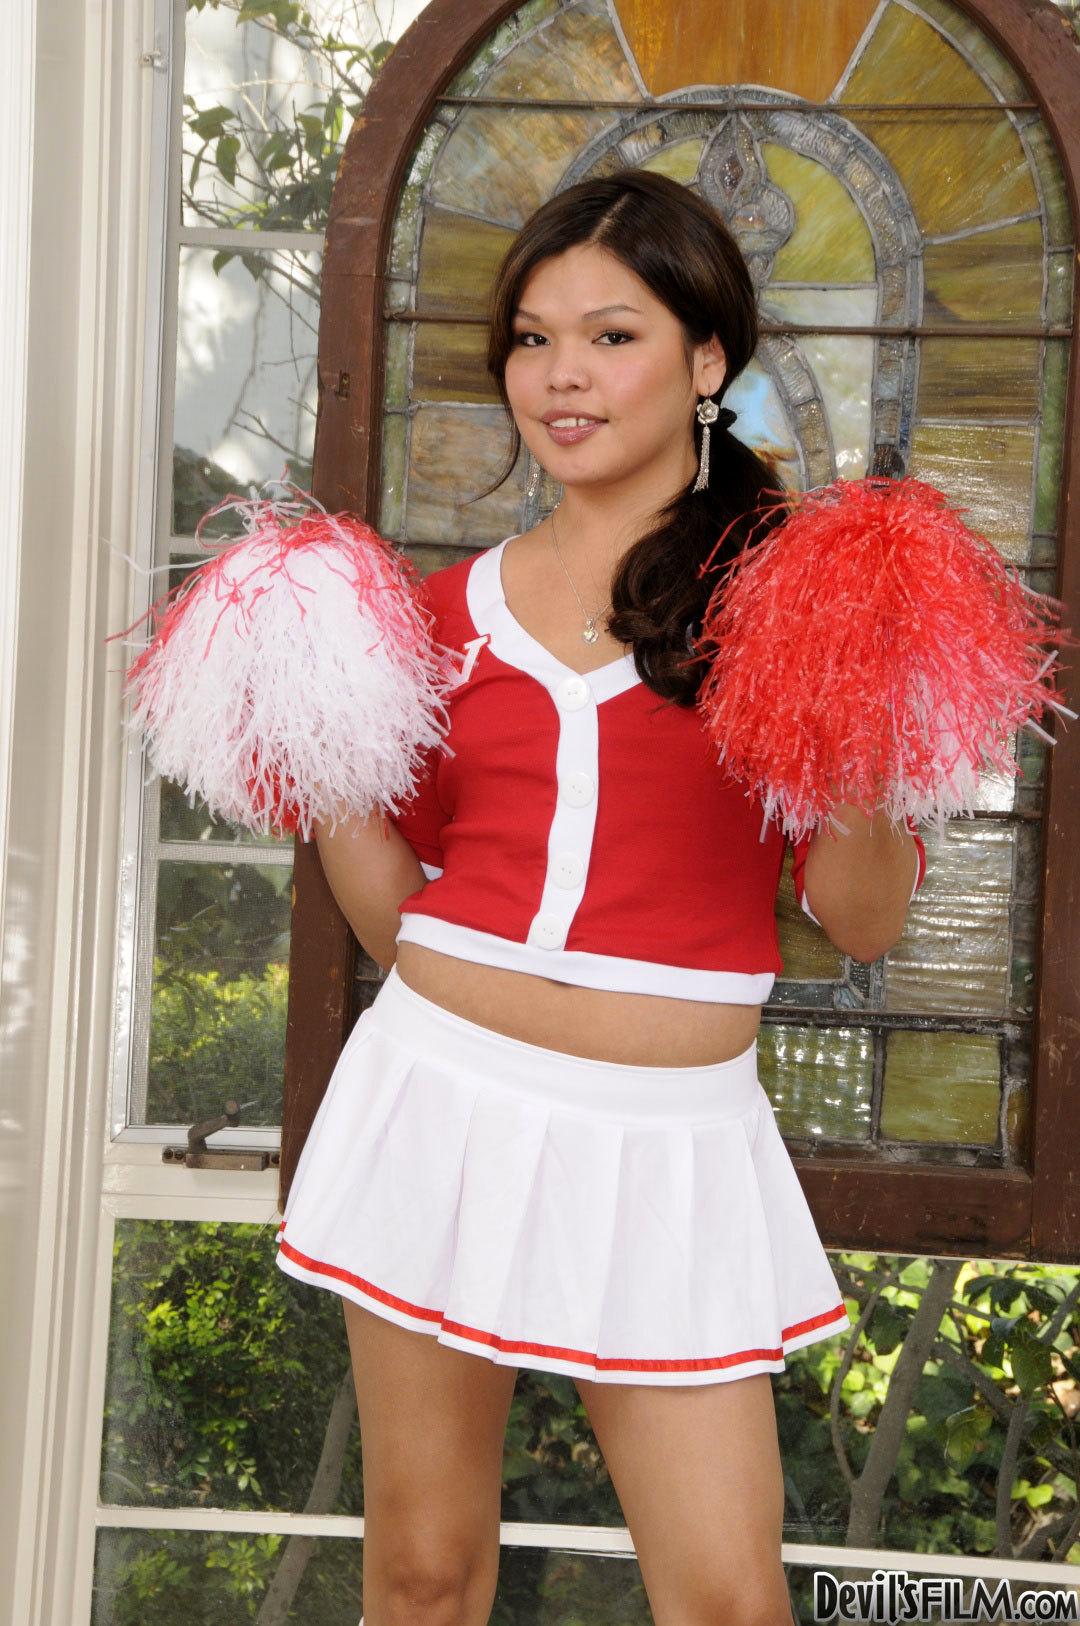 Horny Cheerleader